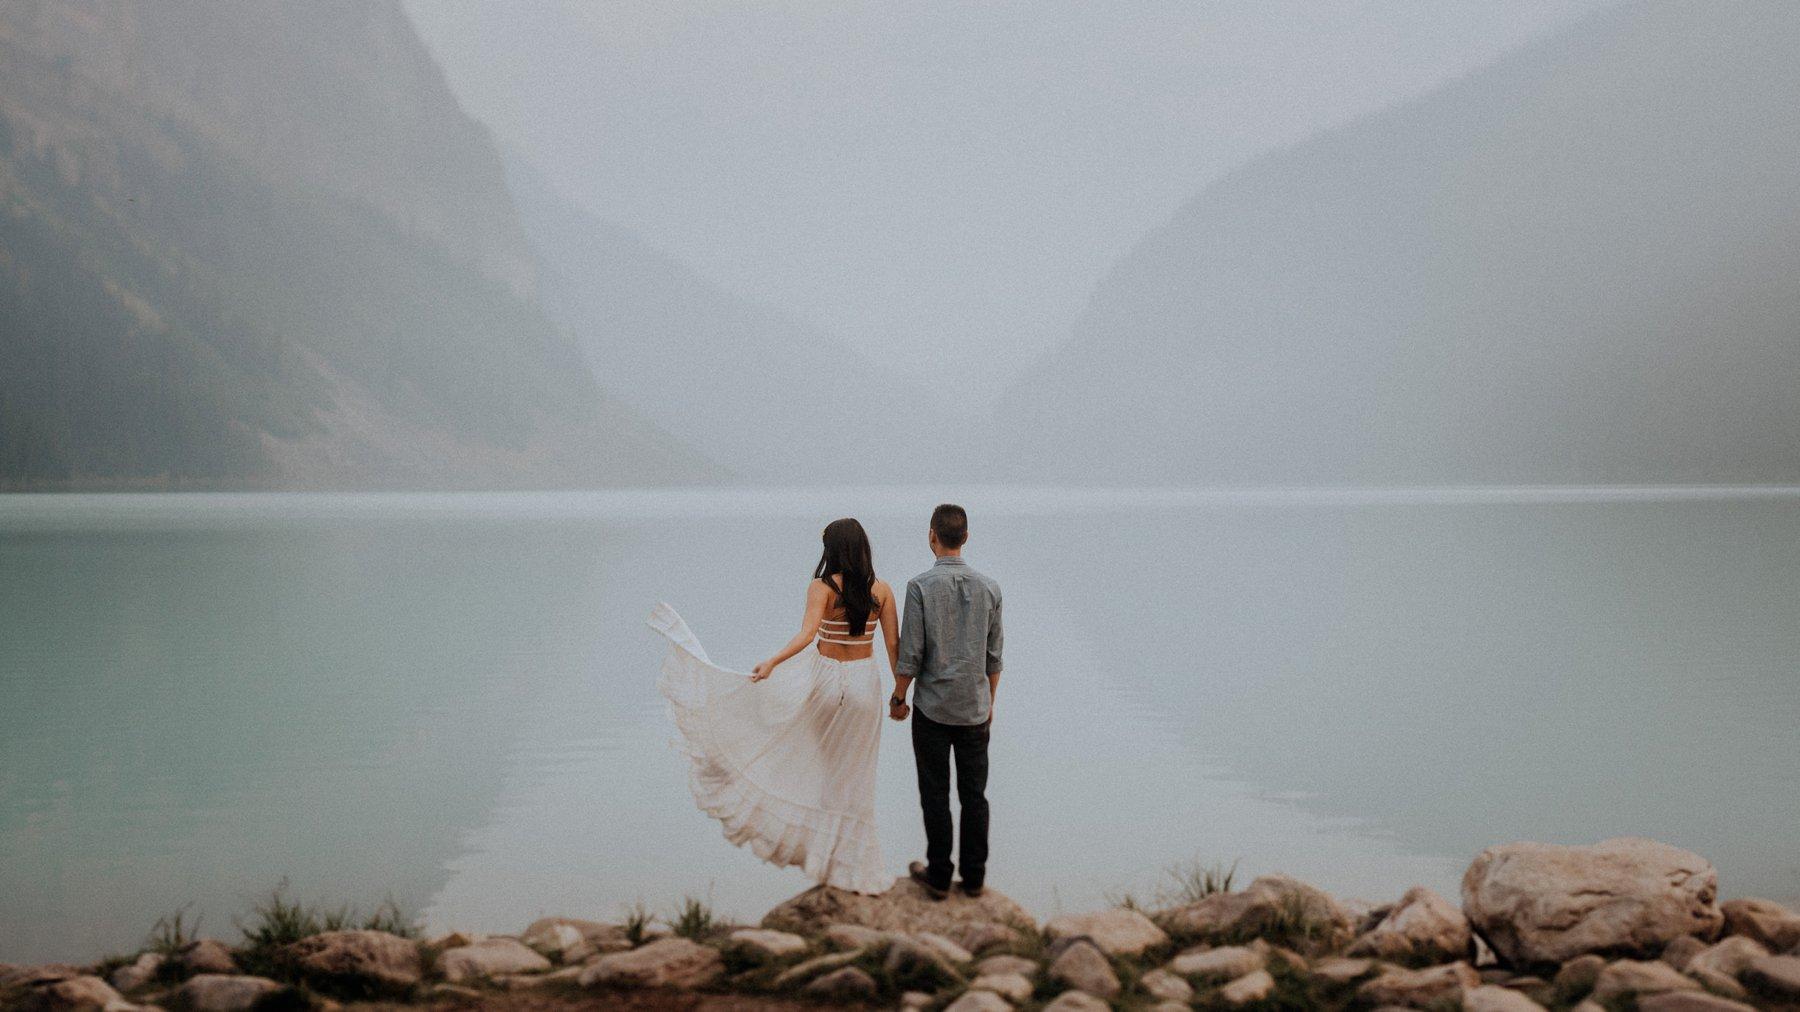 353-365-banff-lake-louise-engagement-session-8.jpg